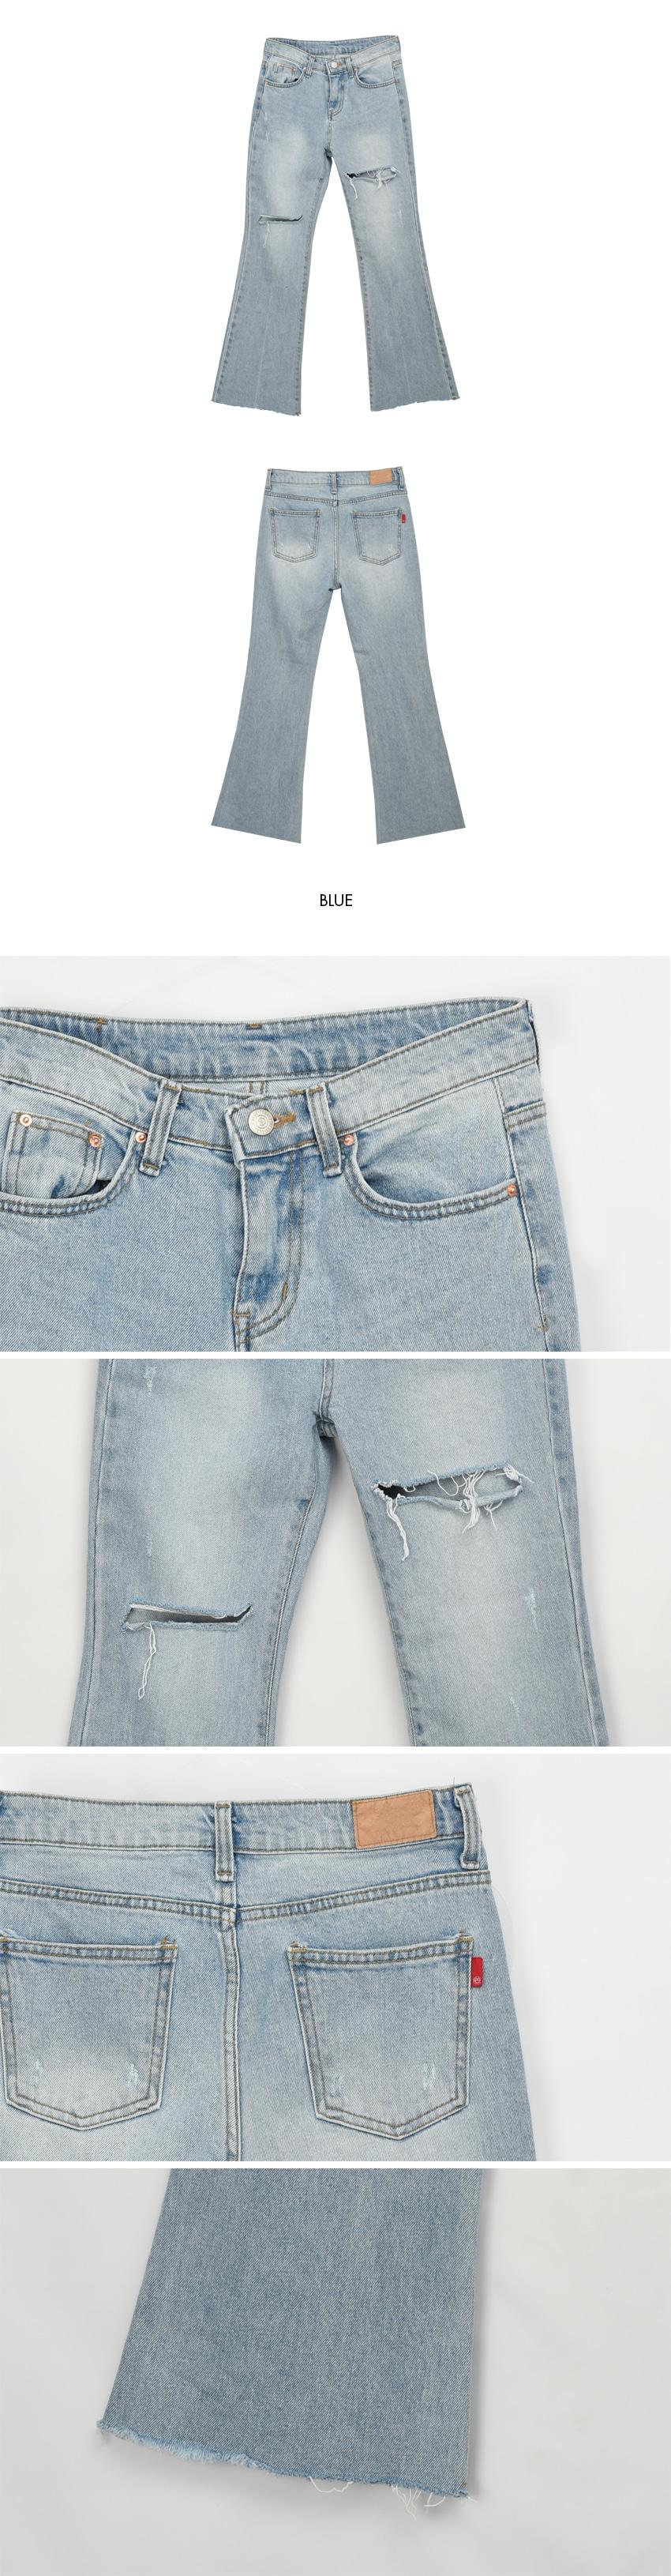 603 denim pants